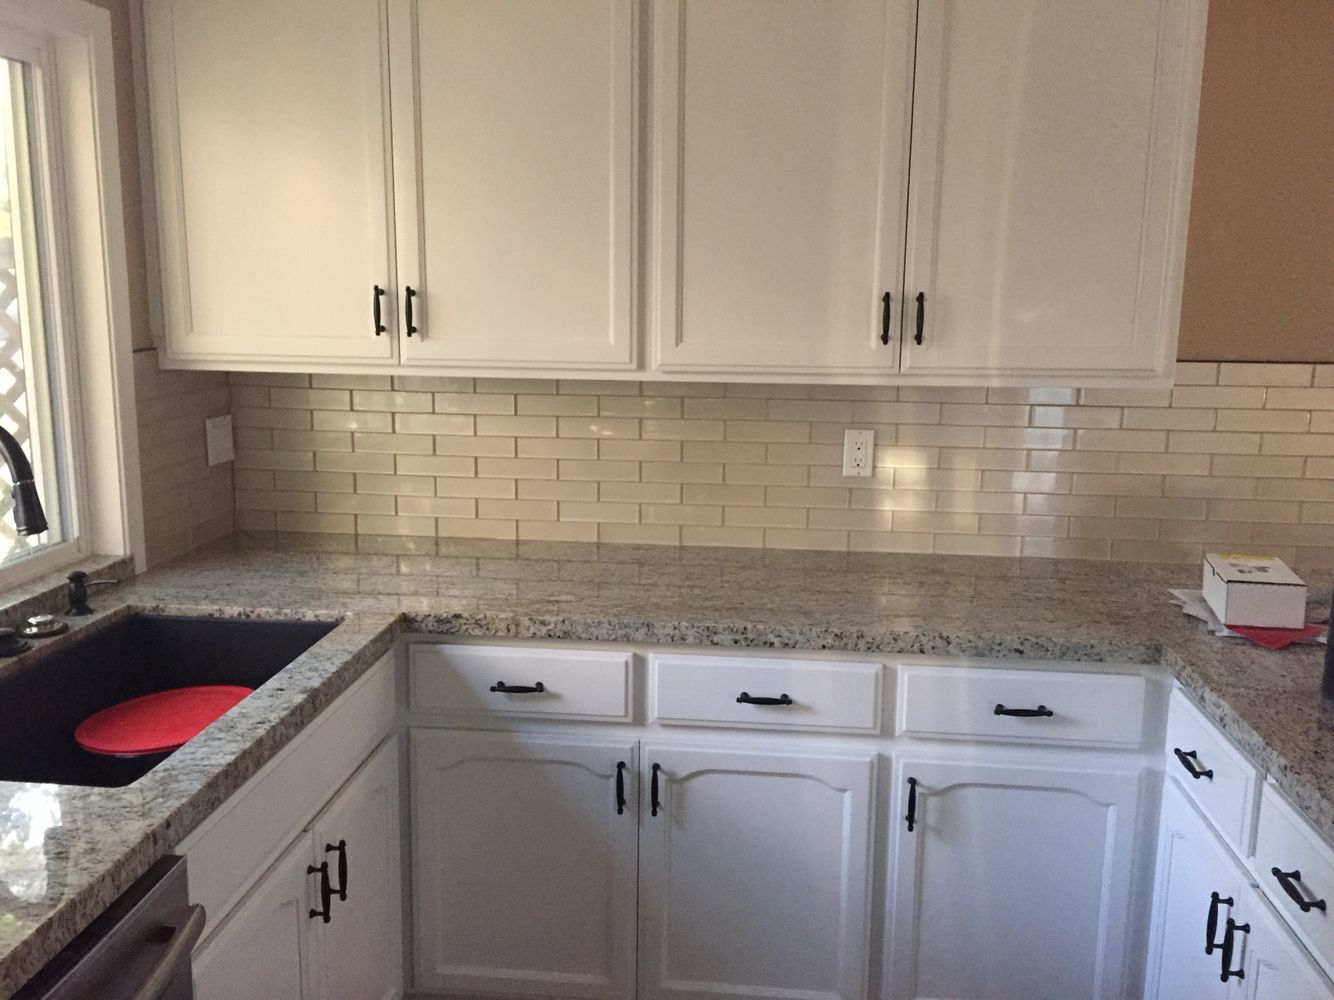 My kitchen antique white cabinets ivory ceramic beveled subway swiss coffee over oak cabinets champagne glass mosaic backsplash giallo ornamental granite dailygadgetfo Gallery